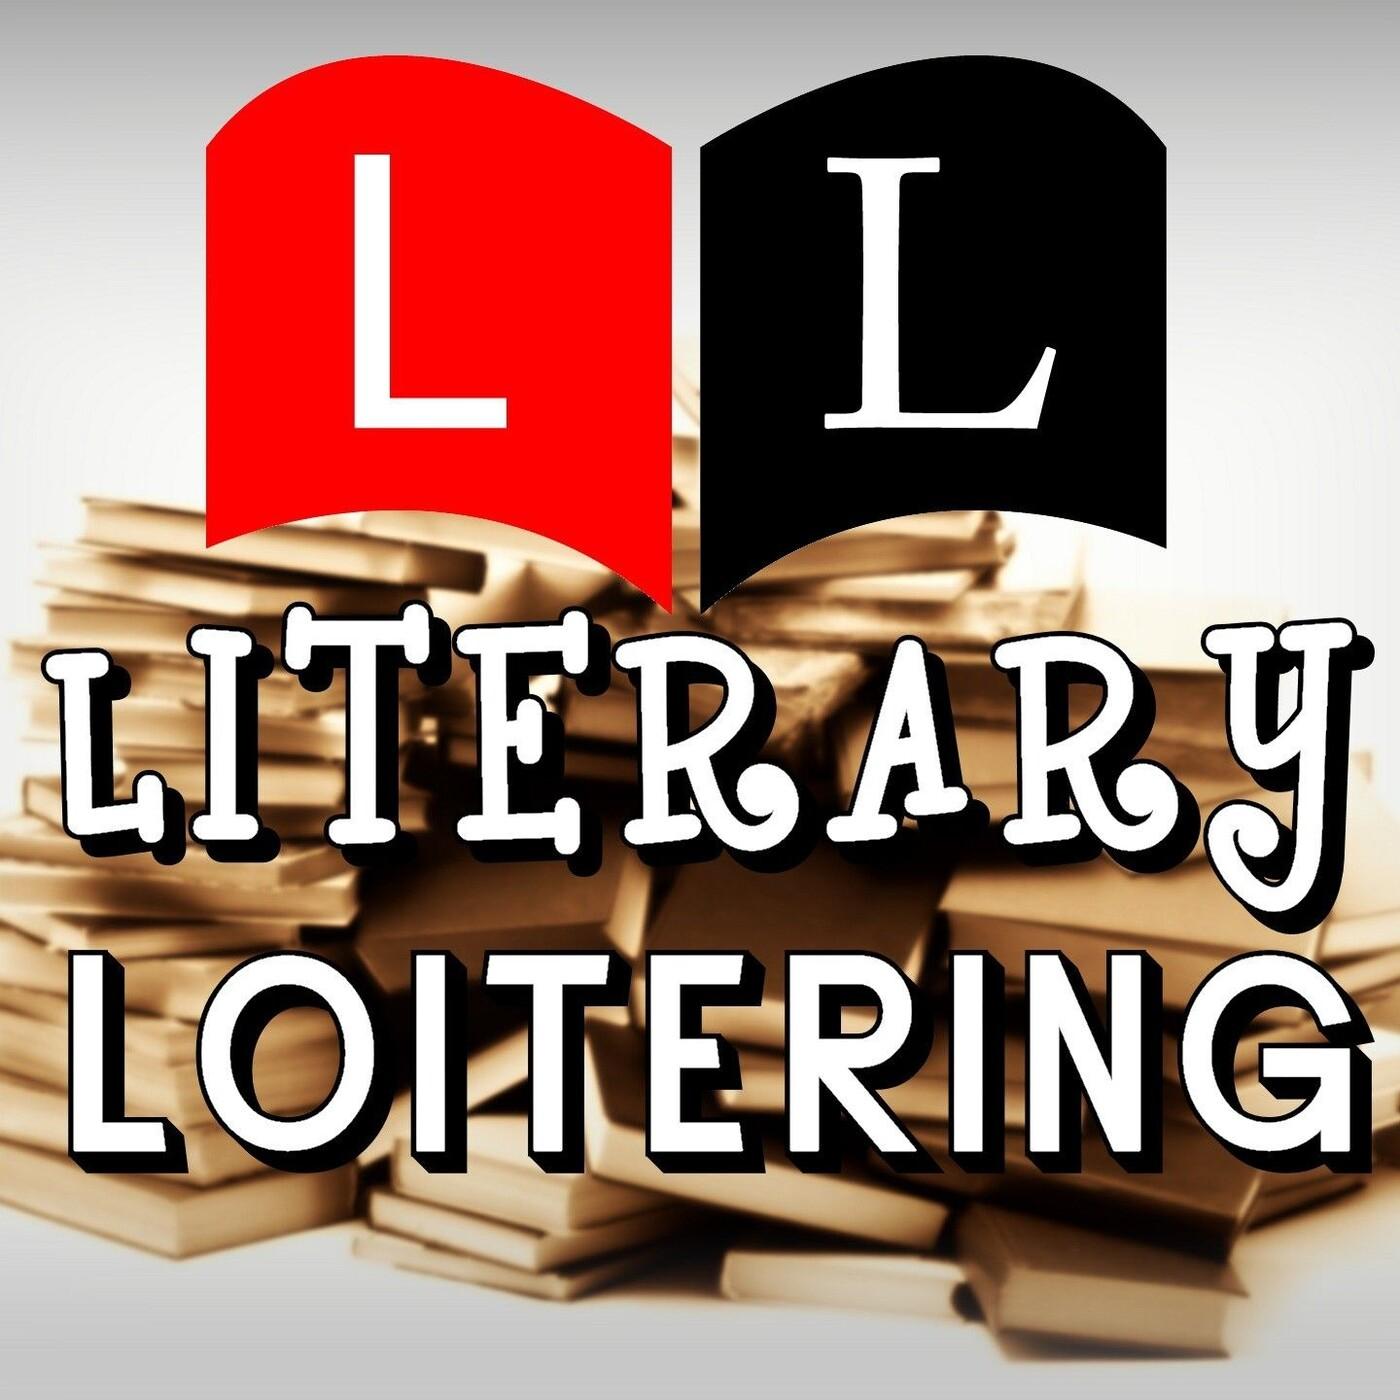 Literary Loitering 75 - Surfer Jesus and the Hang Ten Commandments